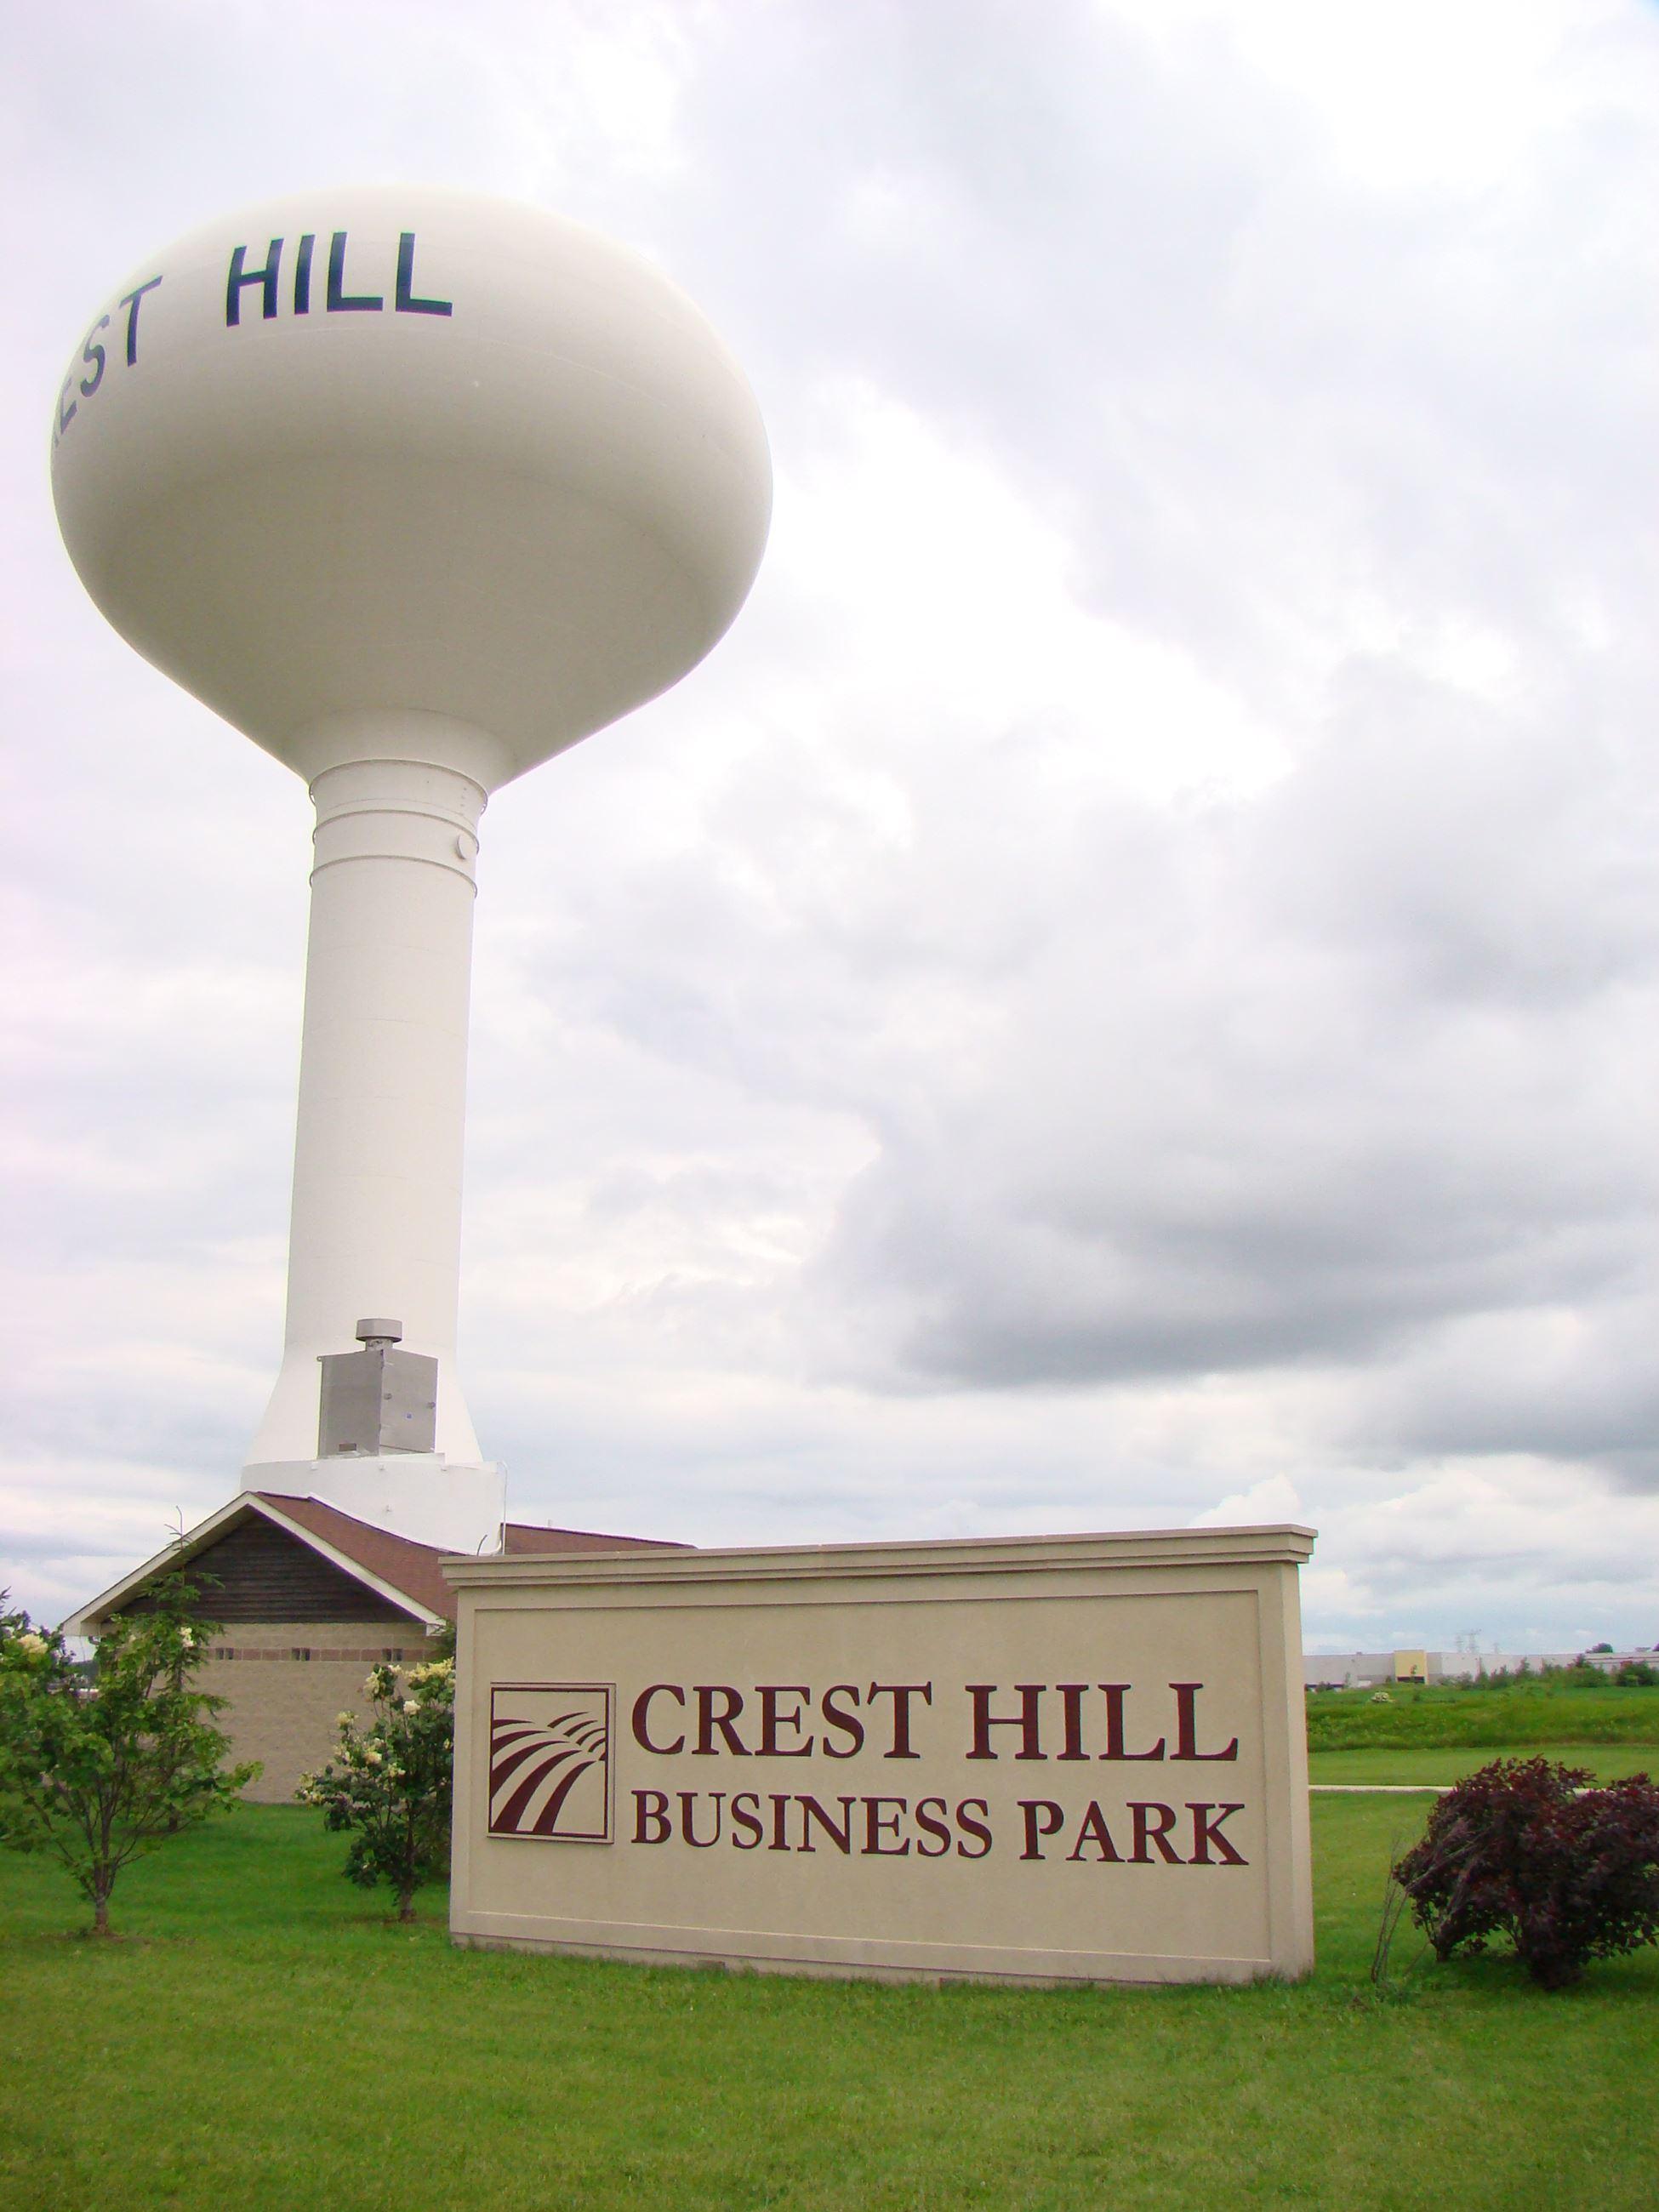 Illinois will county crest hill 60435 - Illinois Will County Crest Hill 60435 21